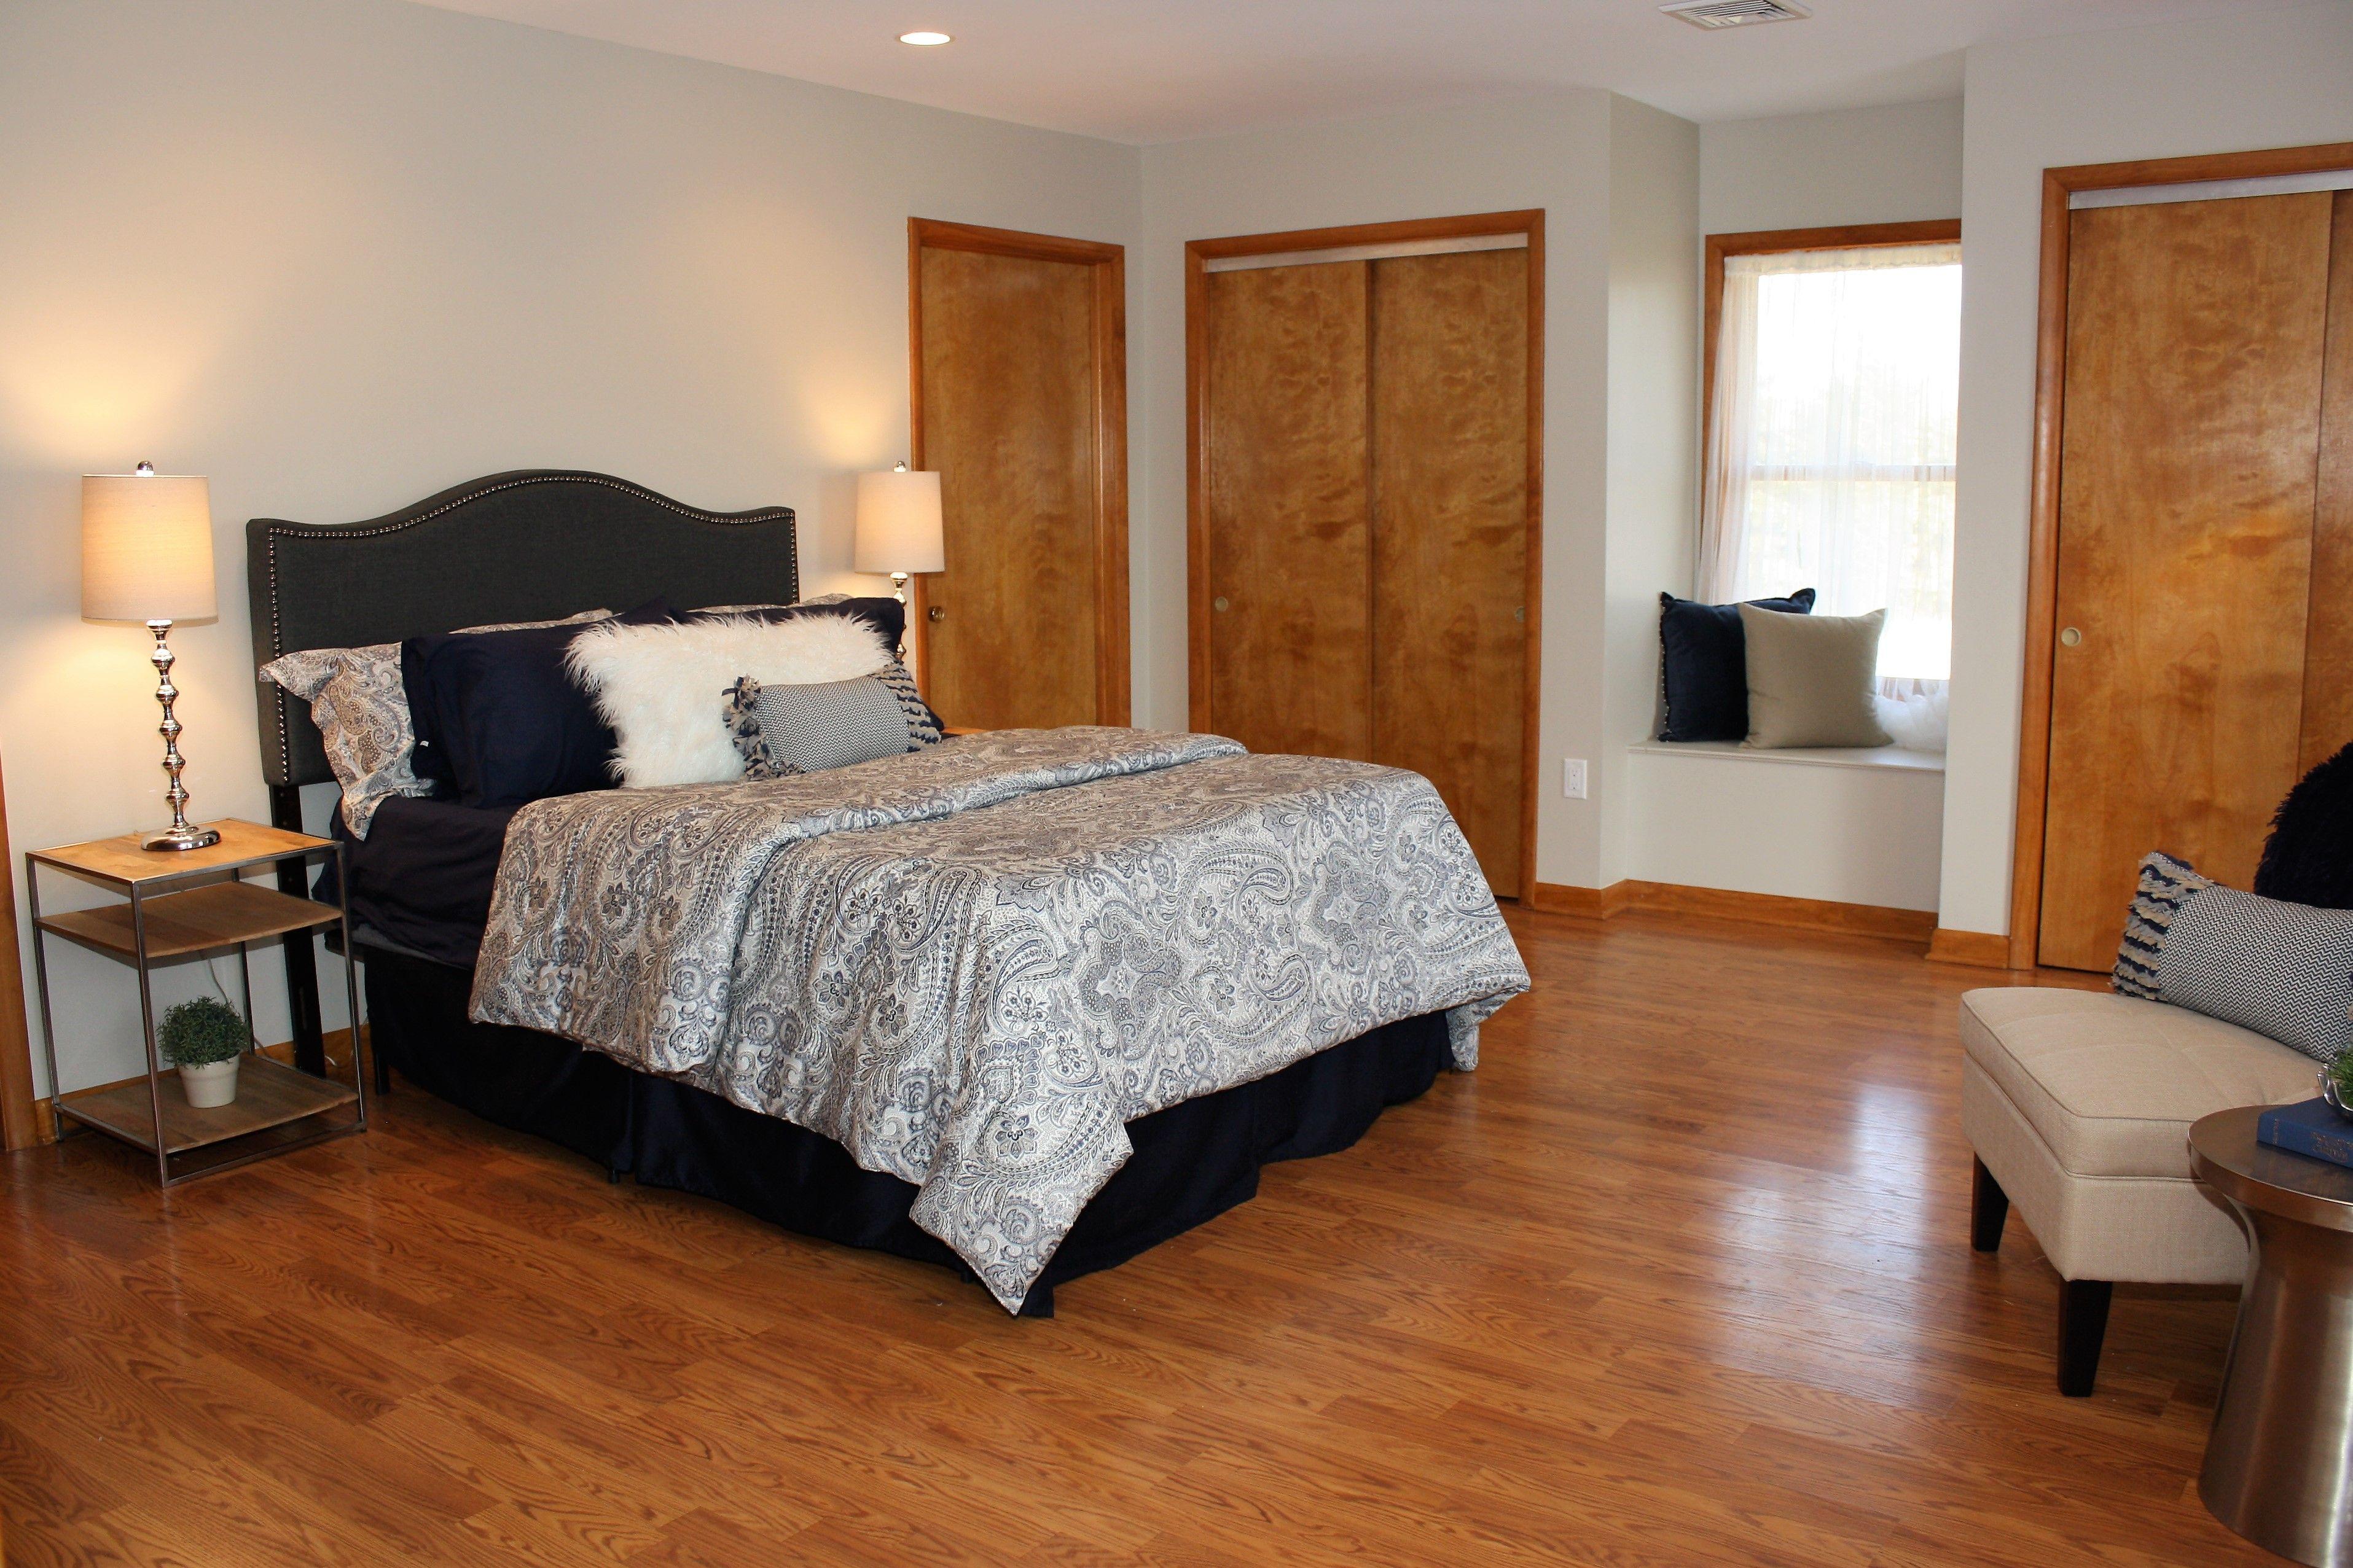 Master bedroom hardwood floors  After Master Bedroom Navy Blue Window Seat Hardwood Floors Dark Gray